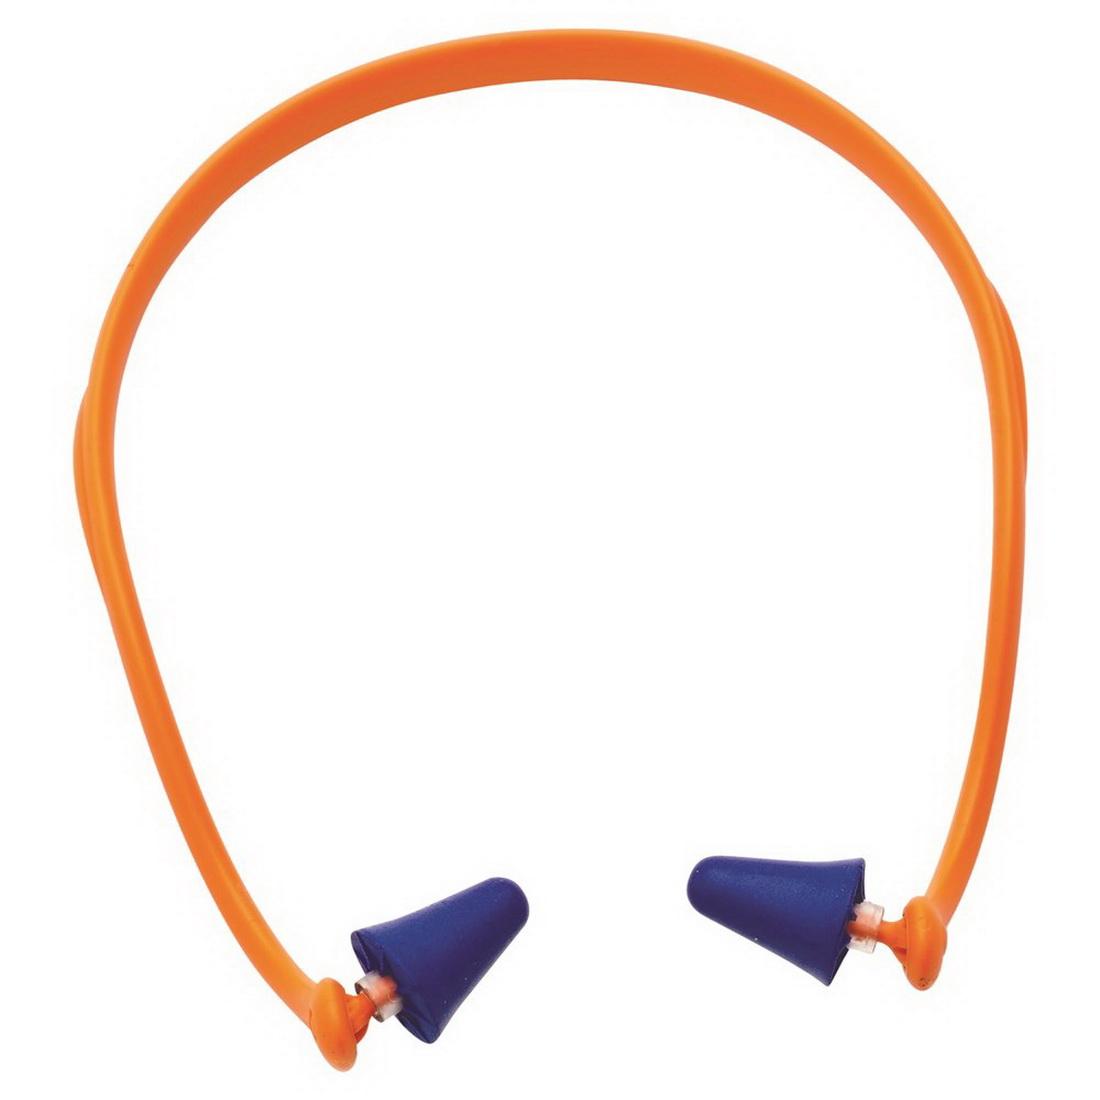 Proband Fixed Headband Earplug